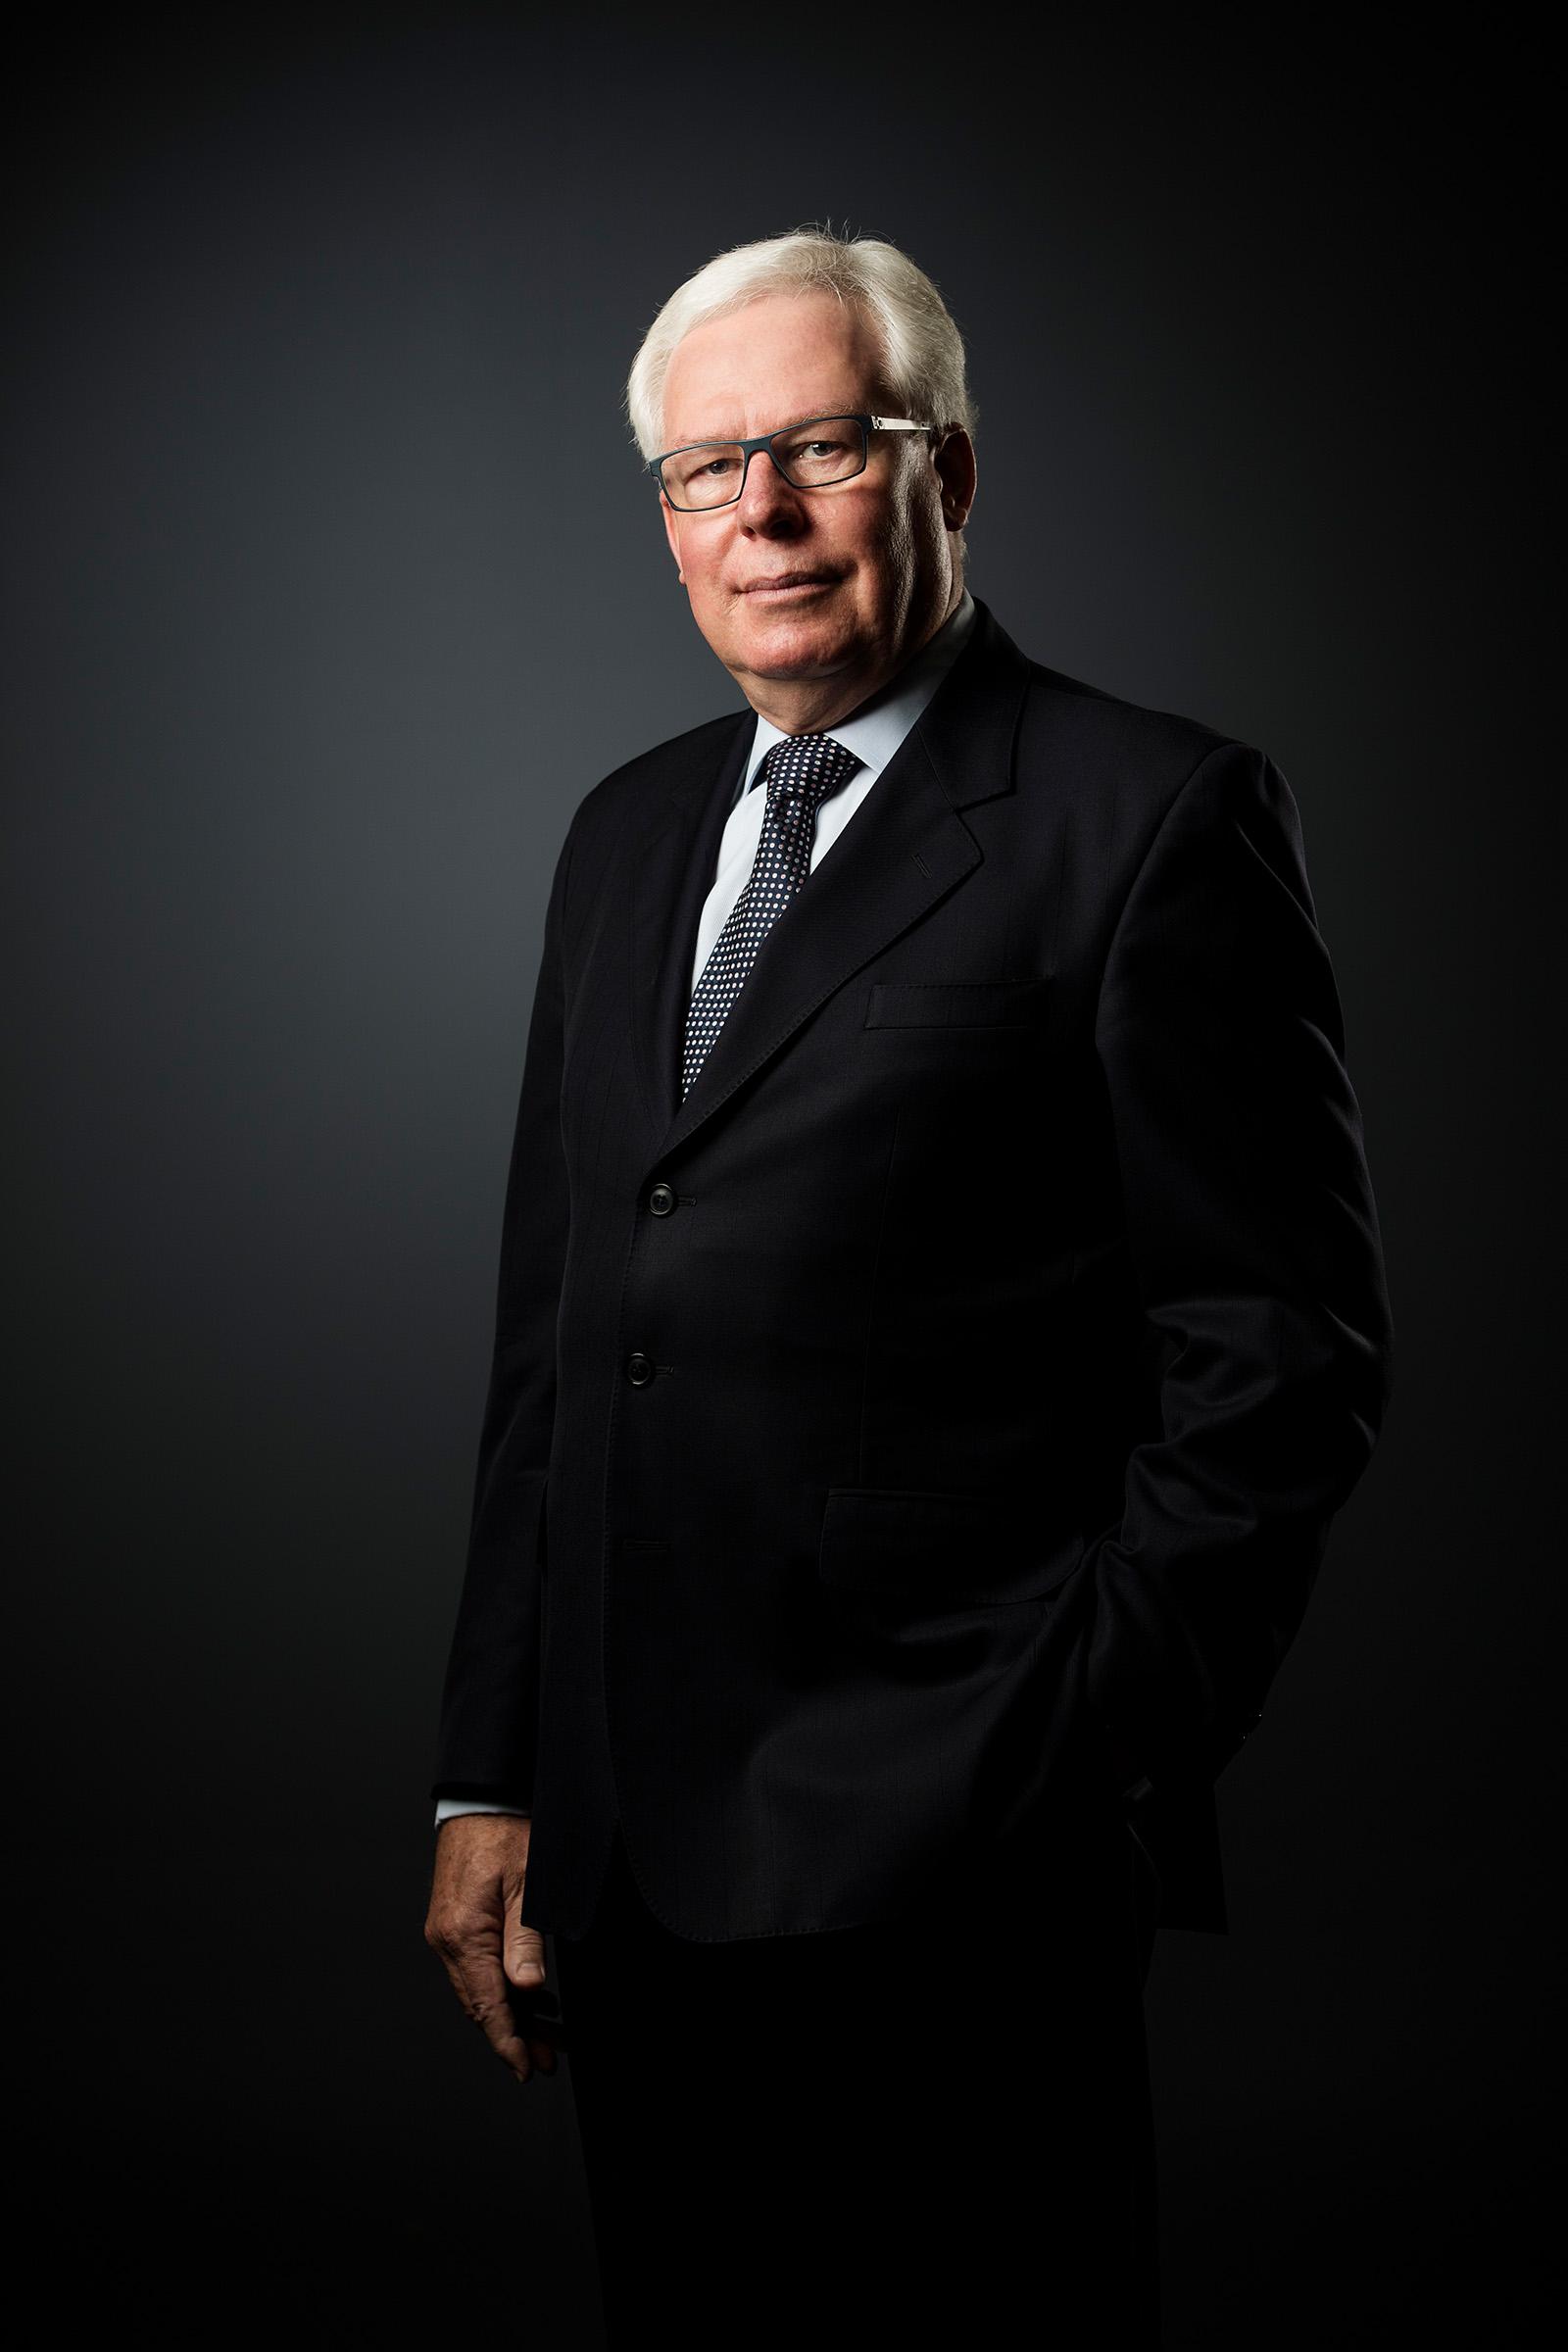 Corporate studio CEO photography Dallas Booth NIBA hand in pocket grey background